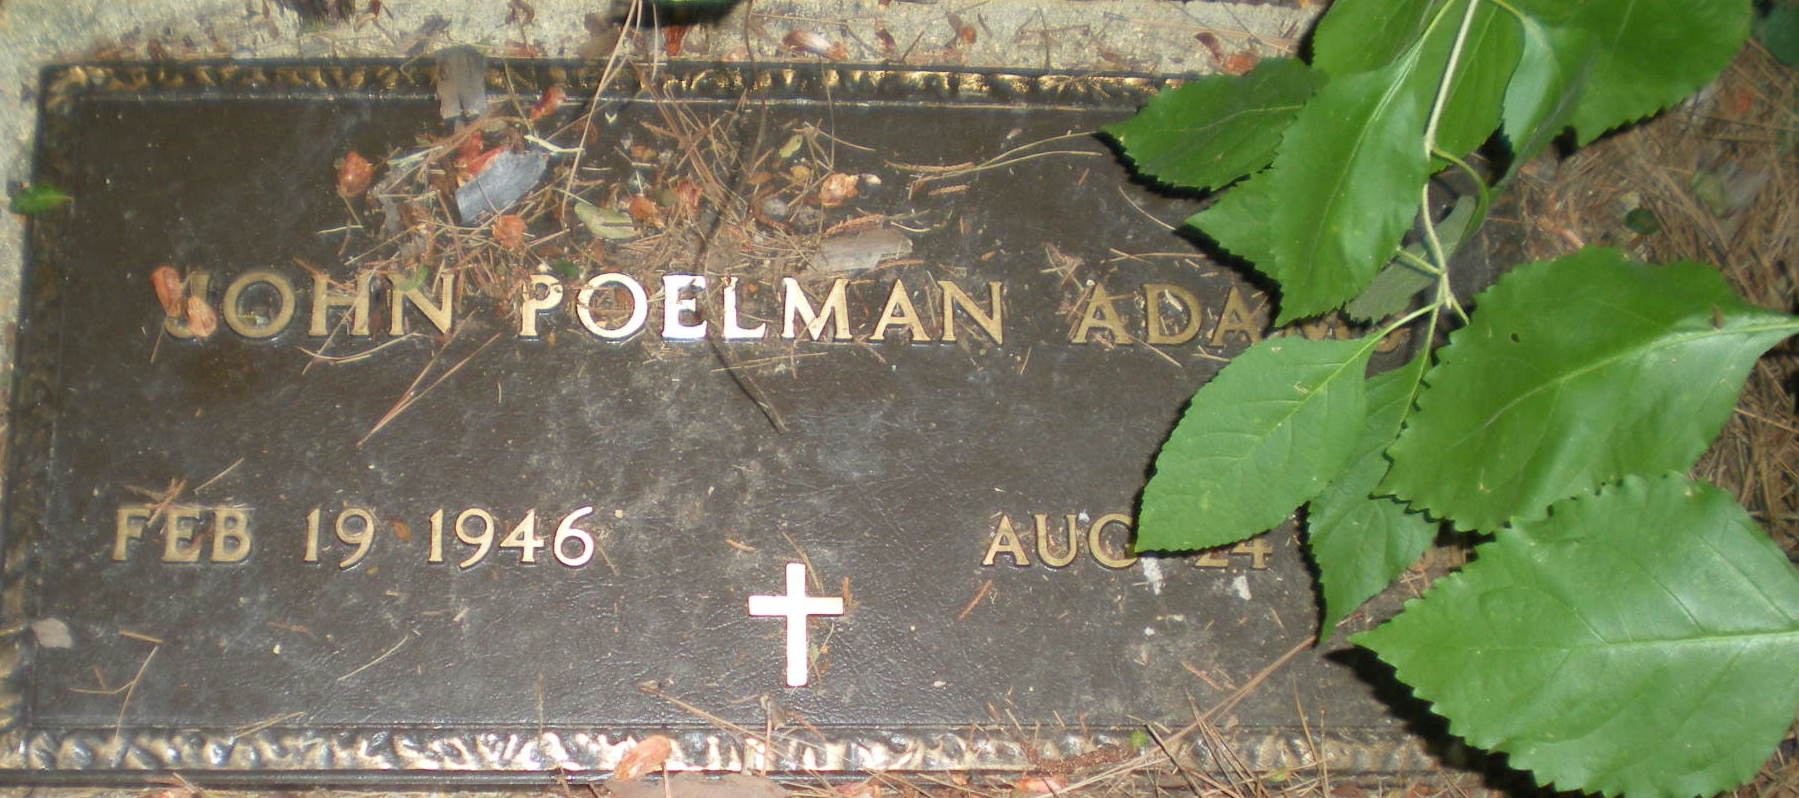 John Poelman Adams